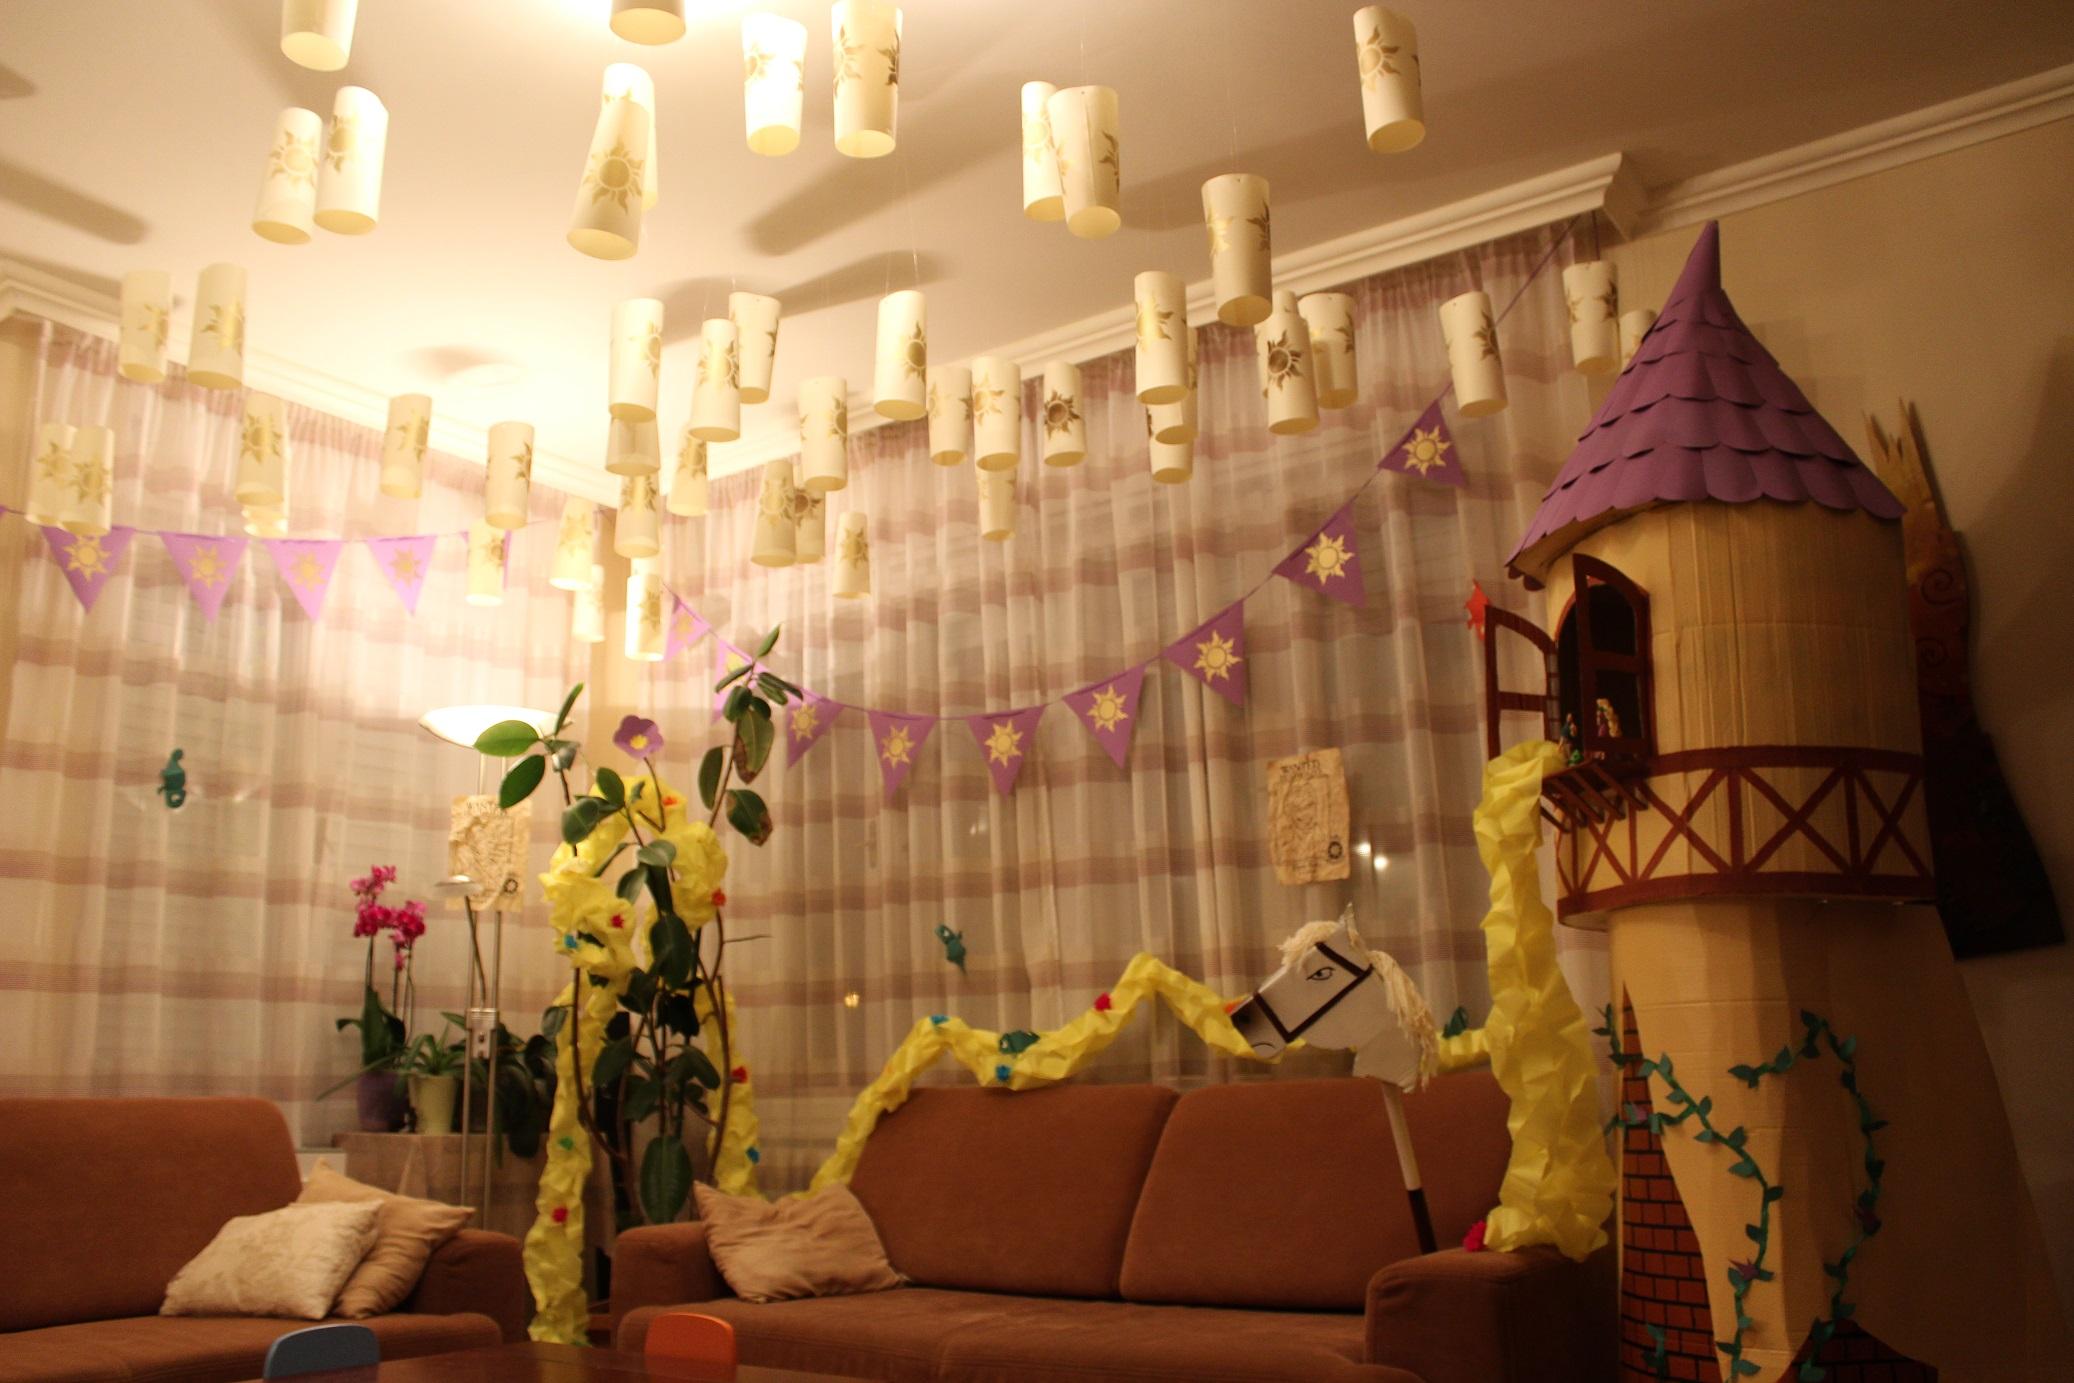 szmk_tangled_aranyhaj_birthday_party_szulinap_dekor_buli_16.JPG